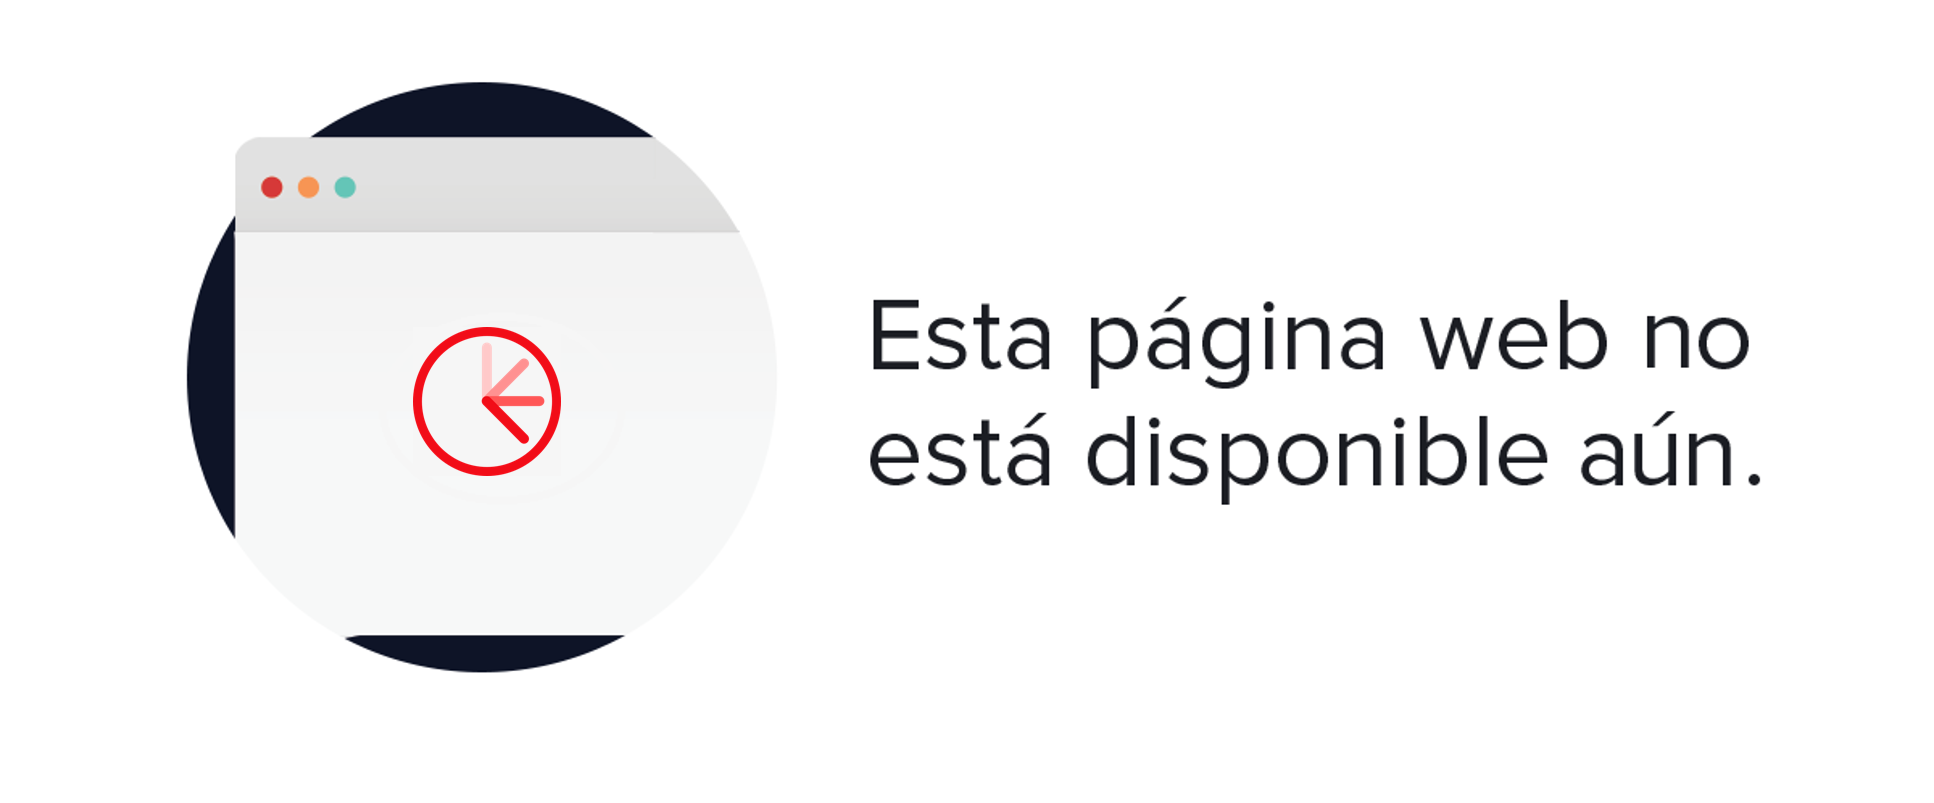 Polo Ralph Lauren - Falda midi de mujer Polo Ralph Lauren realizada en piel Marrón claro 001014962292265002 - BSKRXGN